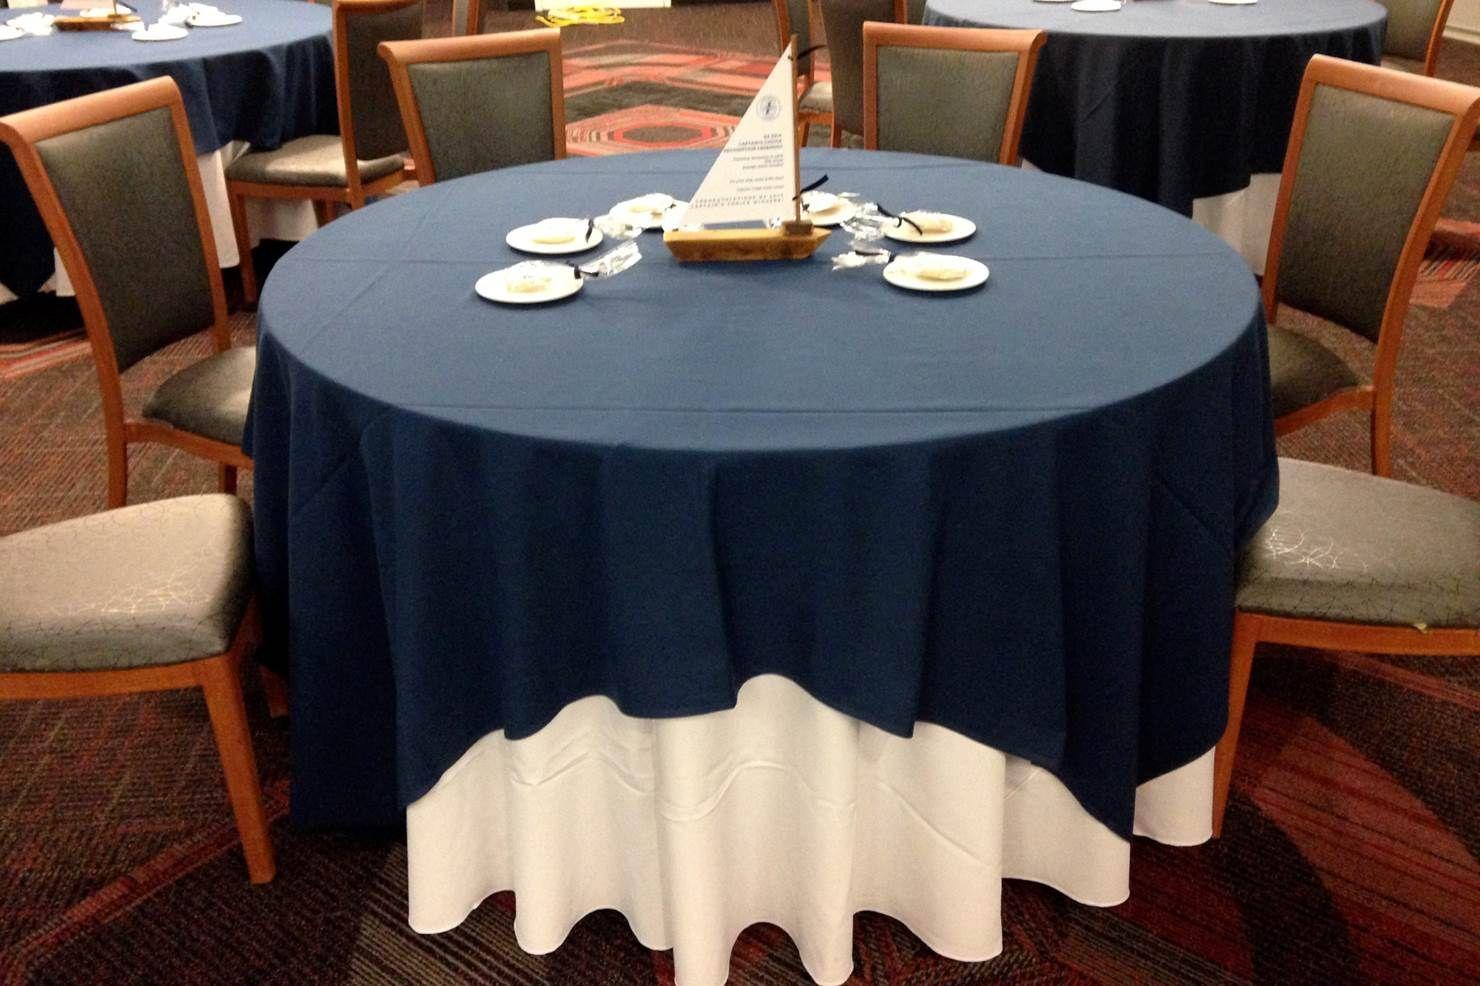 Nautical Table Settings Nautical Table Setting Nautical Luncheon Pinterest Nautical